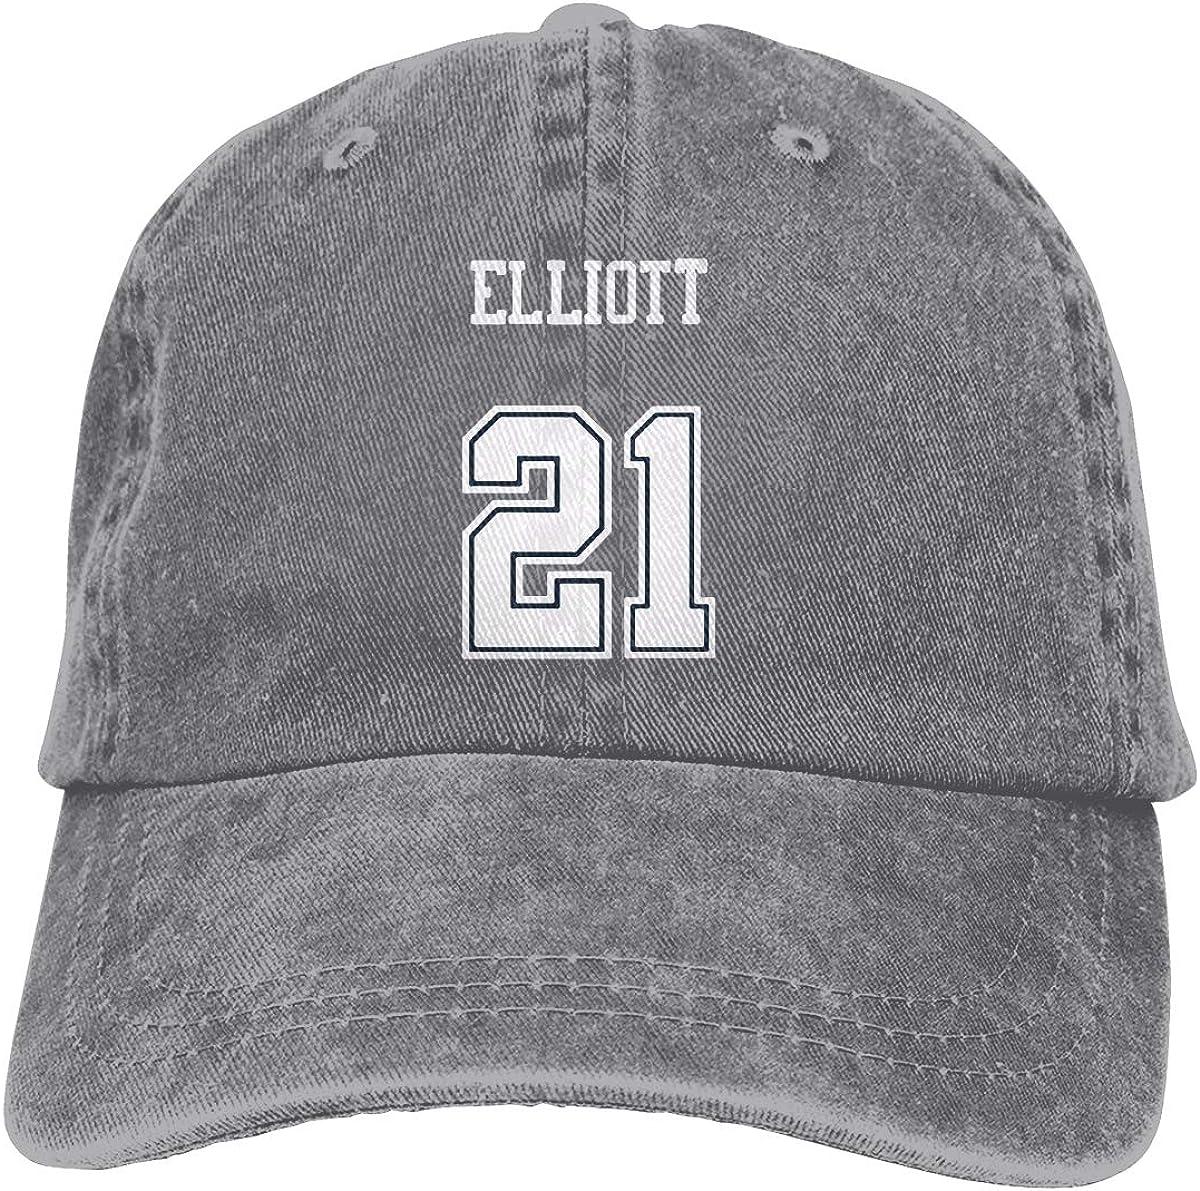 Unisex Football Ezekiel Elliott Snapback Baseball Cap Flat Brim Hip Hop Hat Adjustable Dad Hat